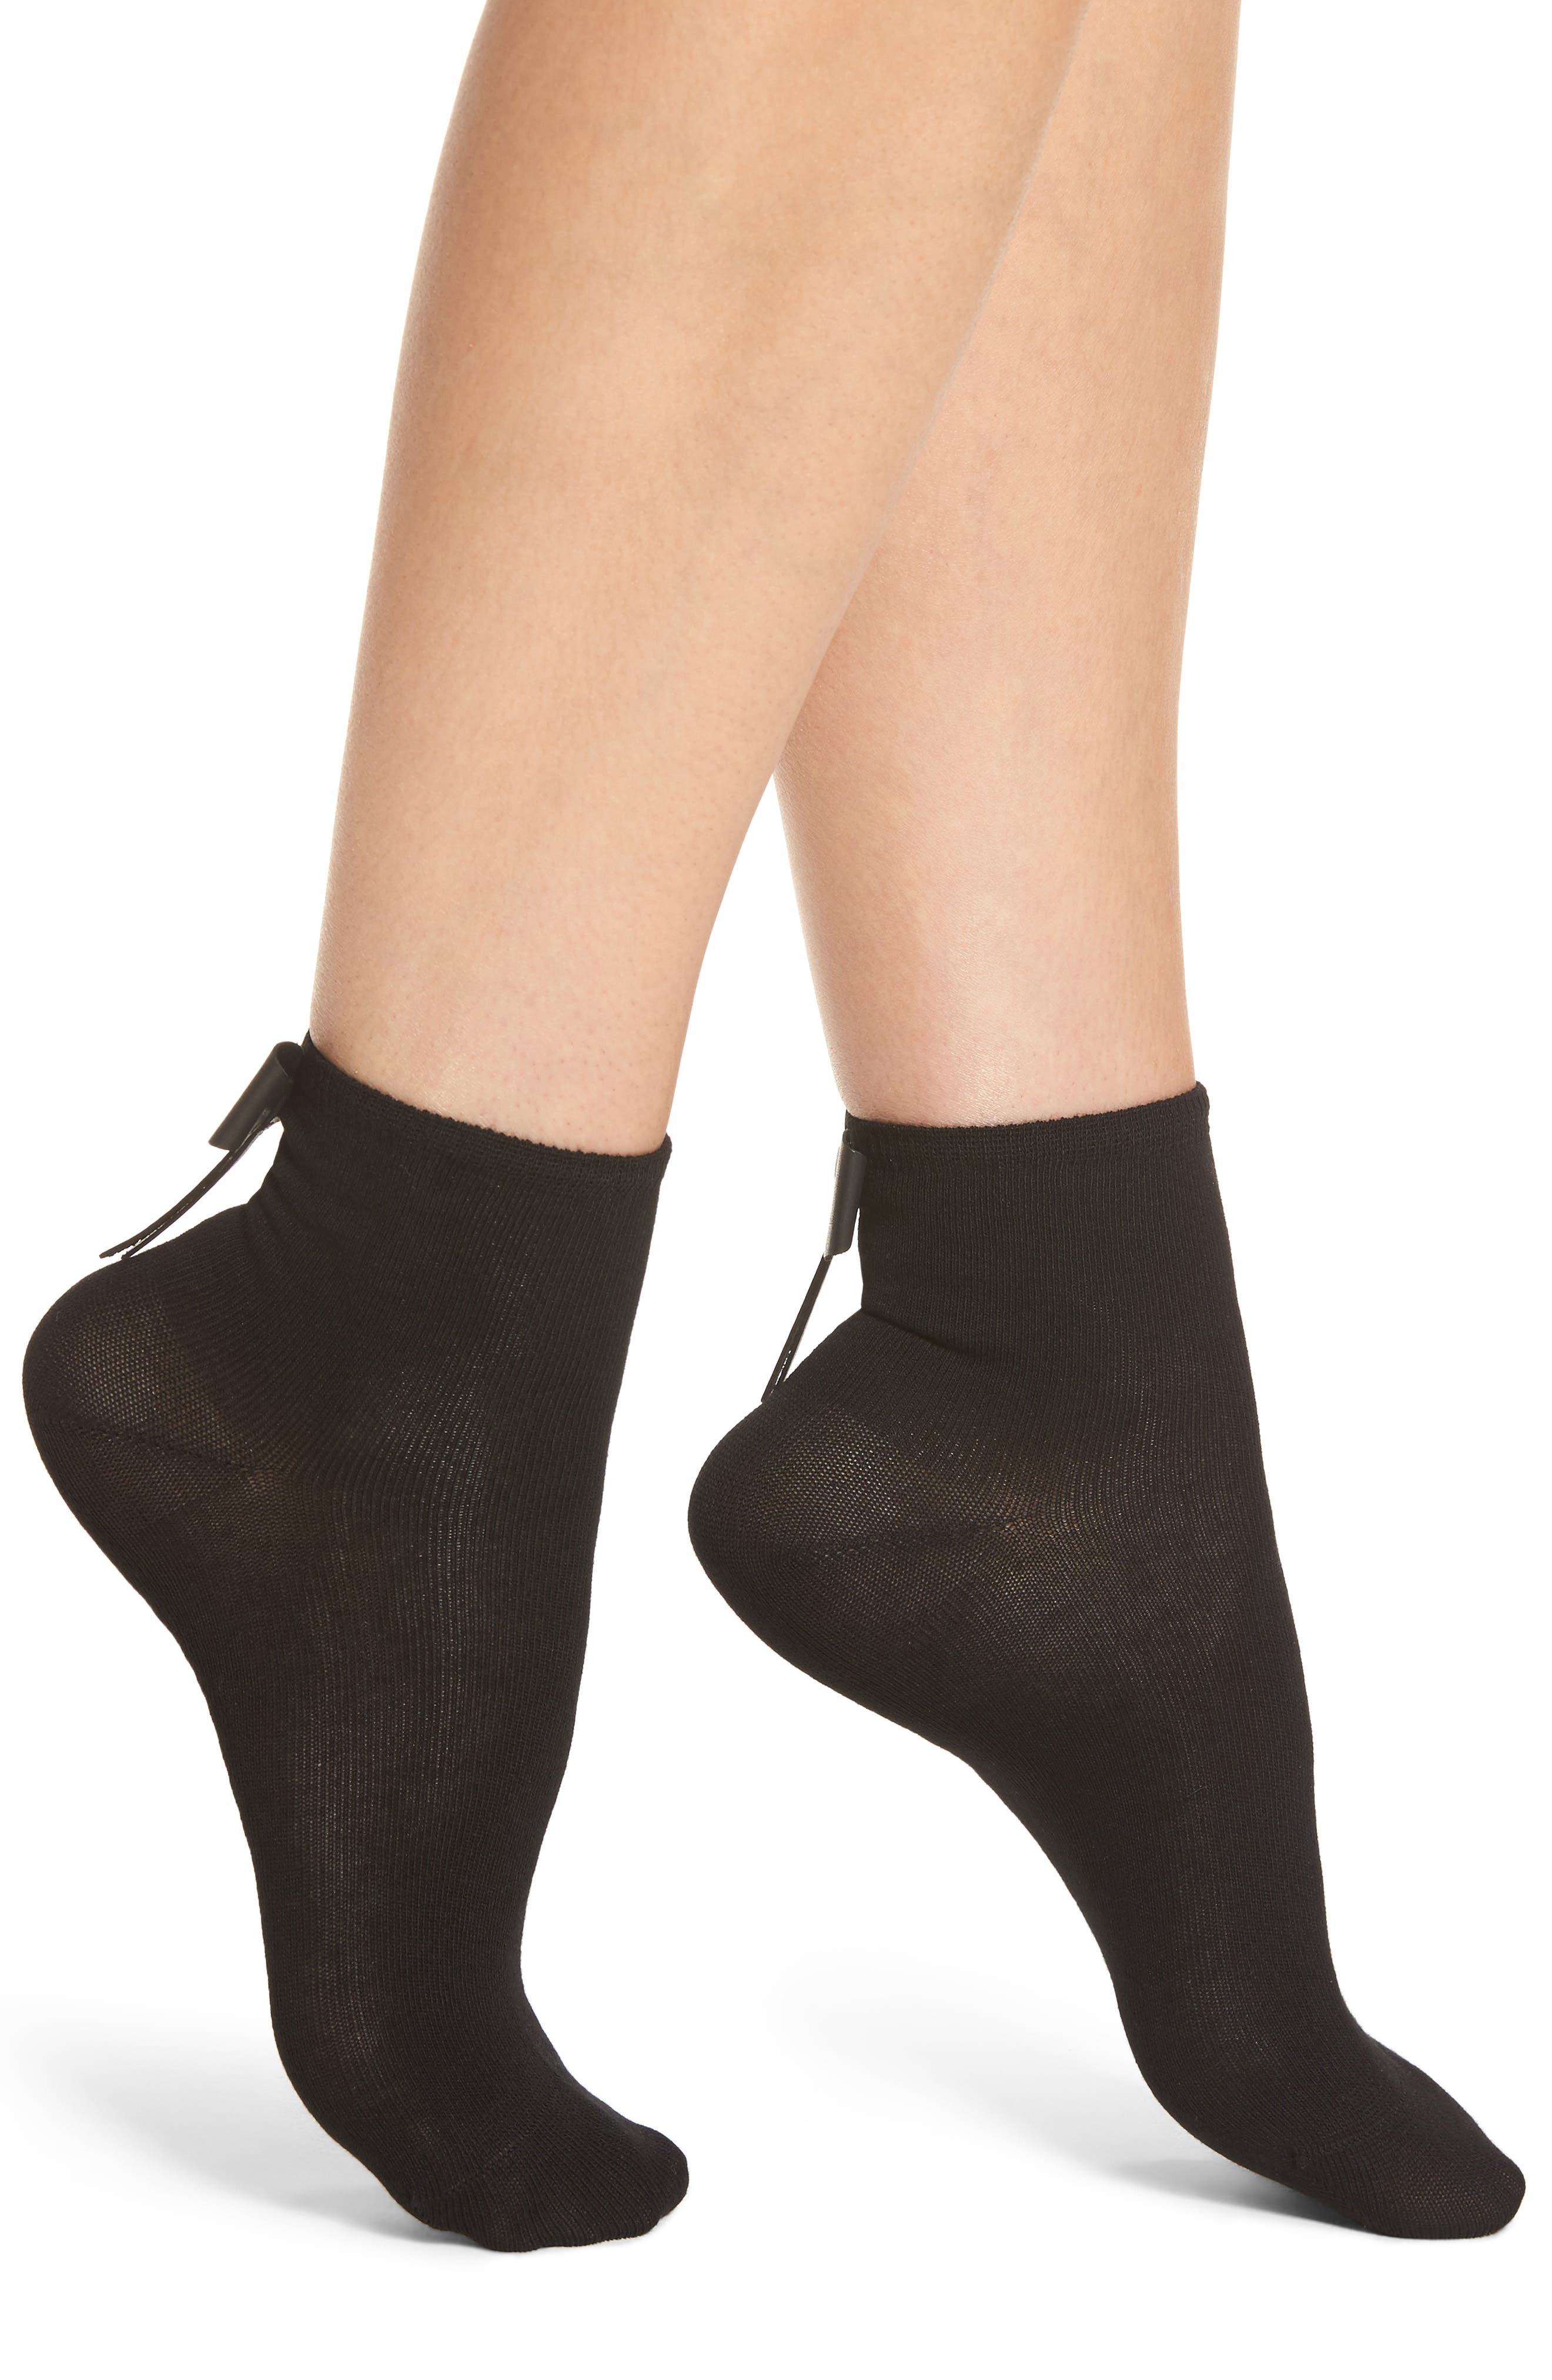 Bow Socks,                         Main,                         color,